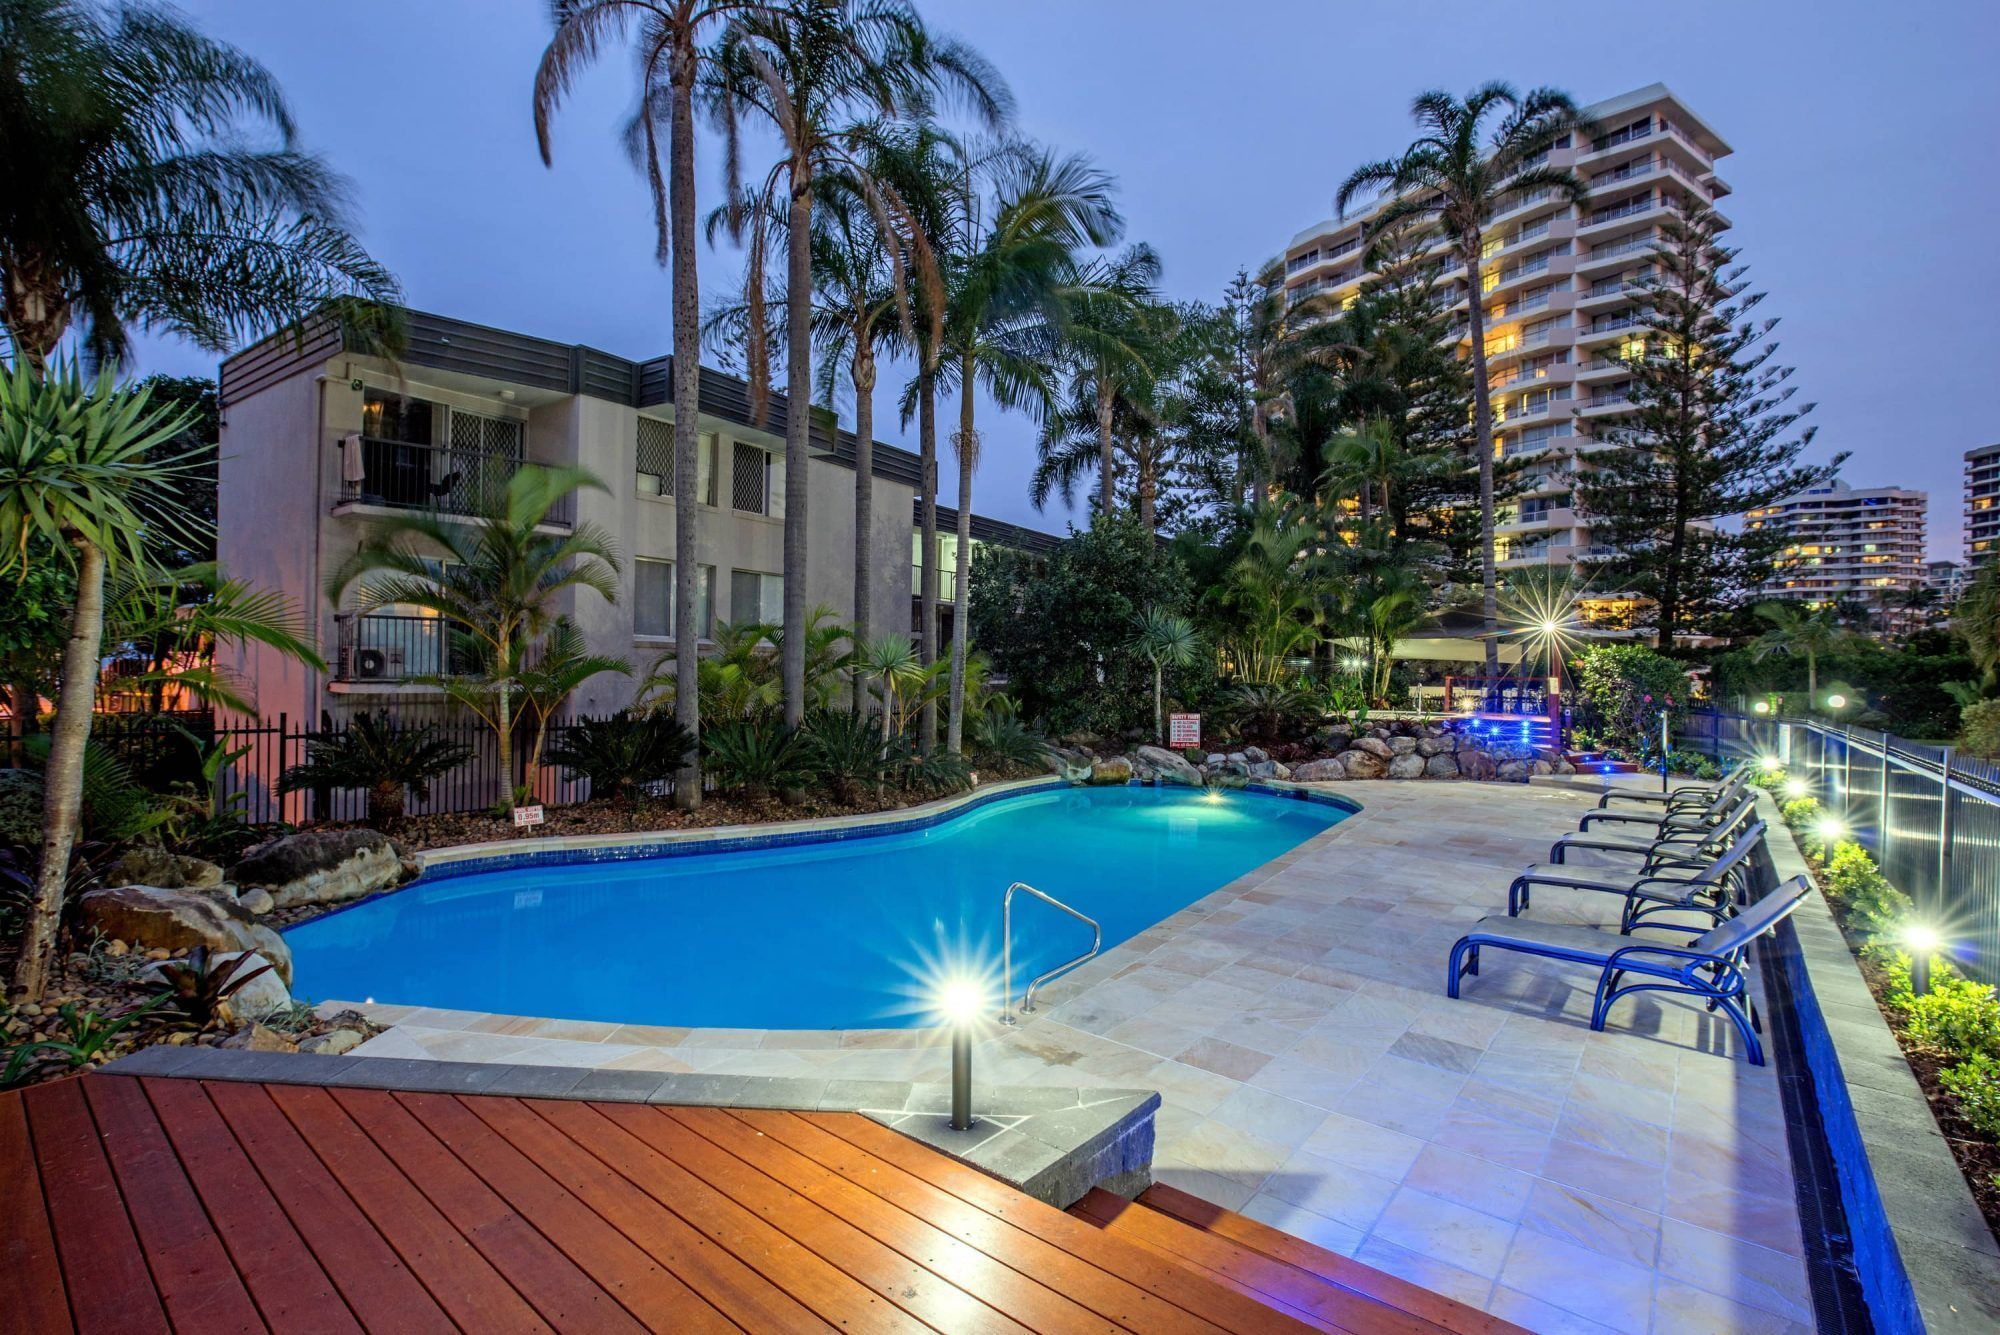 surfers paradise accommodation baronnet apartments rh baronnet com au